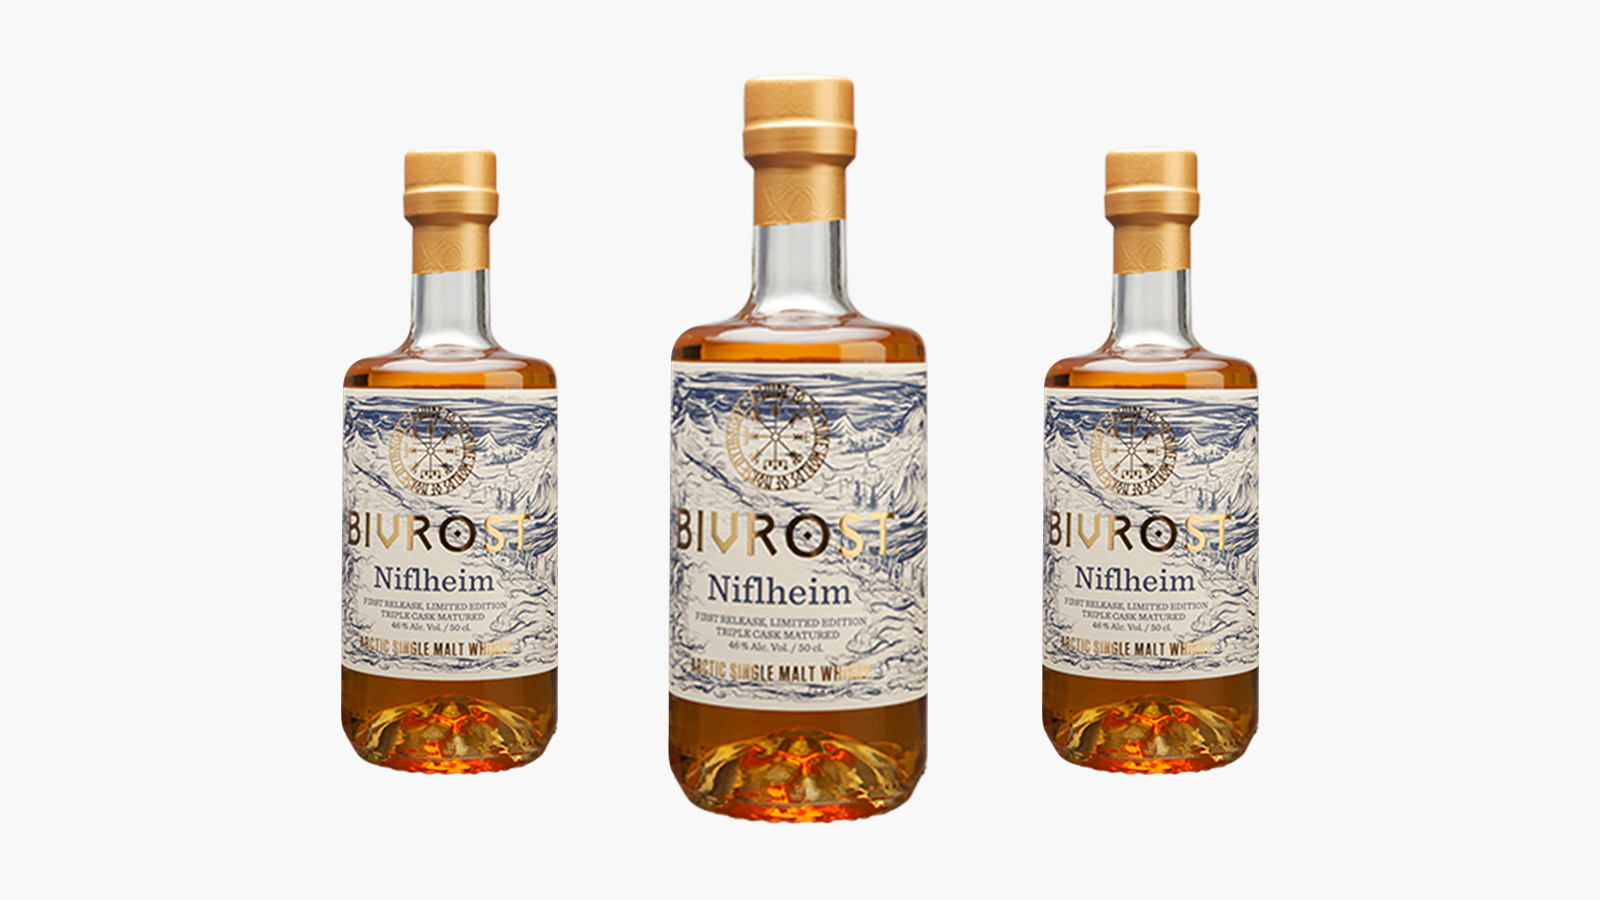 BivrostNiflheim Single Malt Whisky